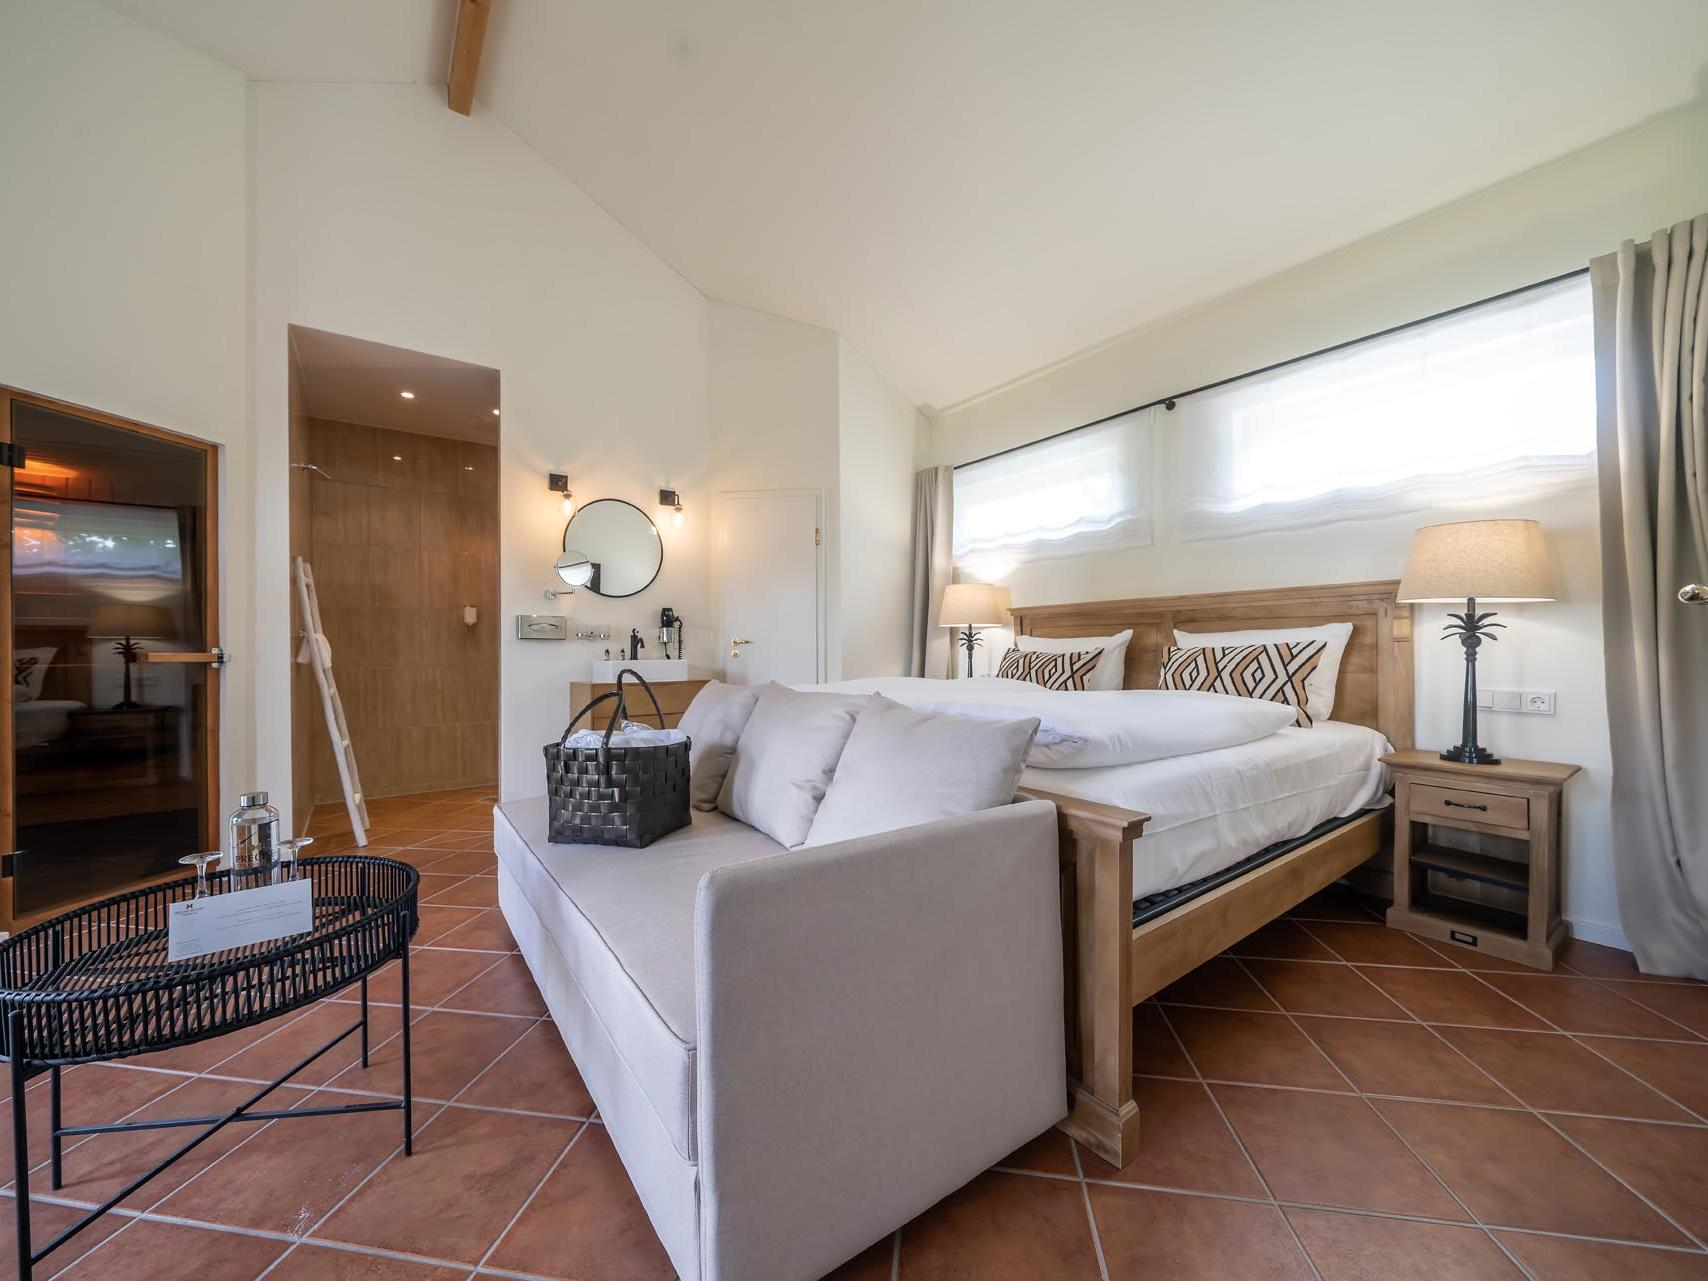 Sauna suite at Precise Resort Schwielowsee